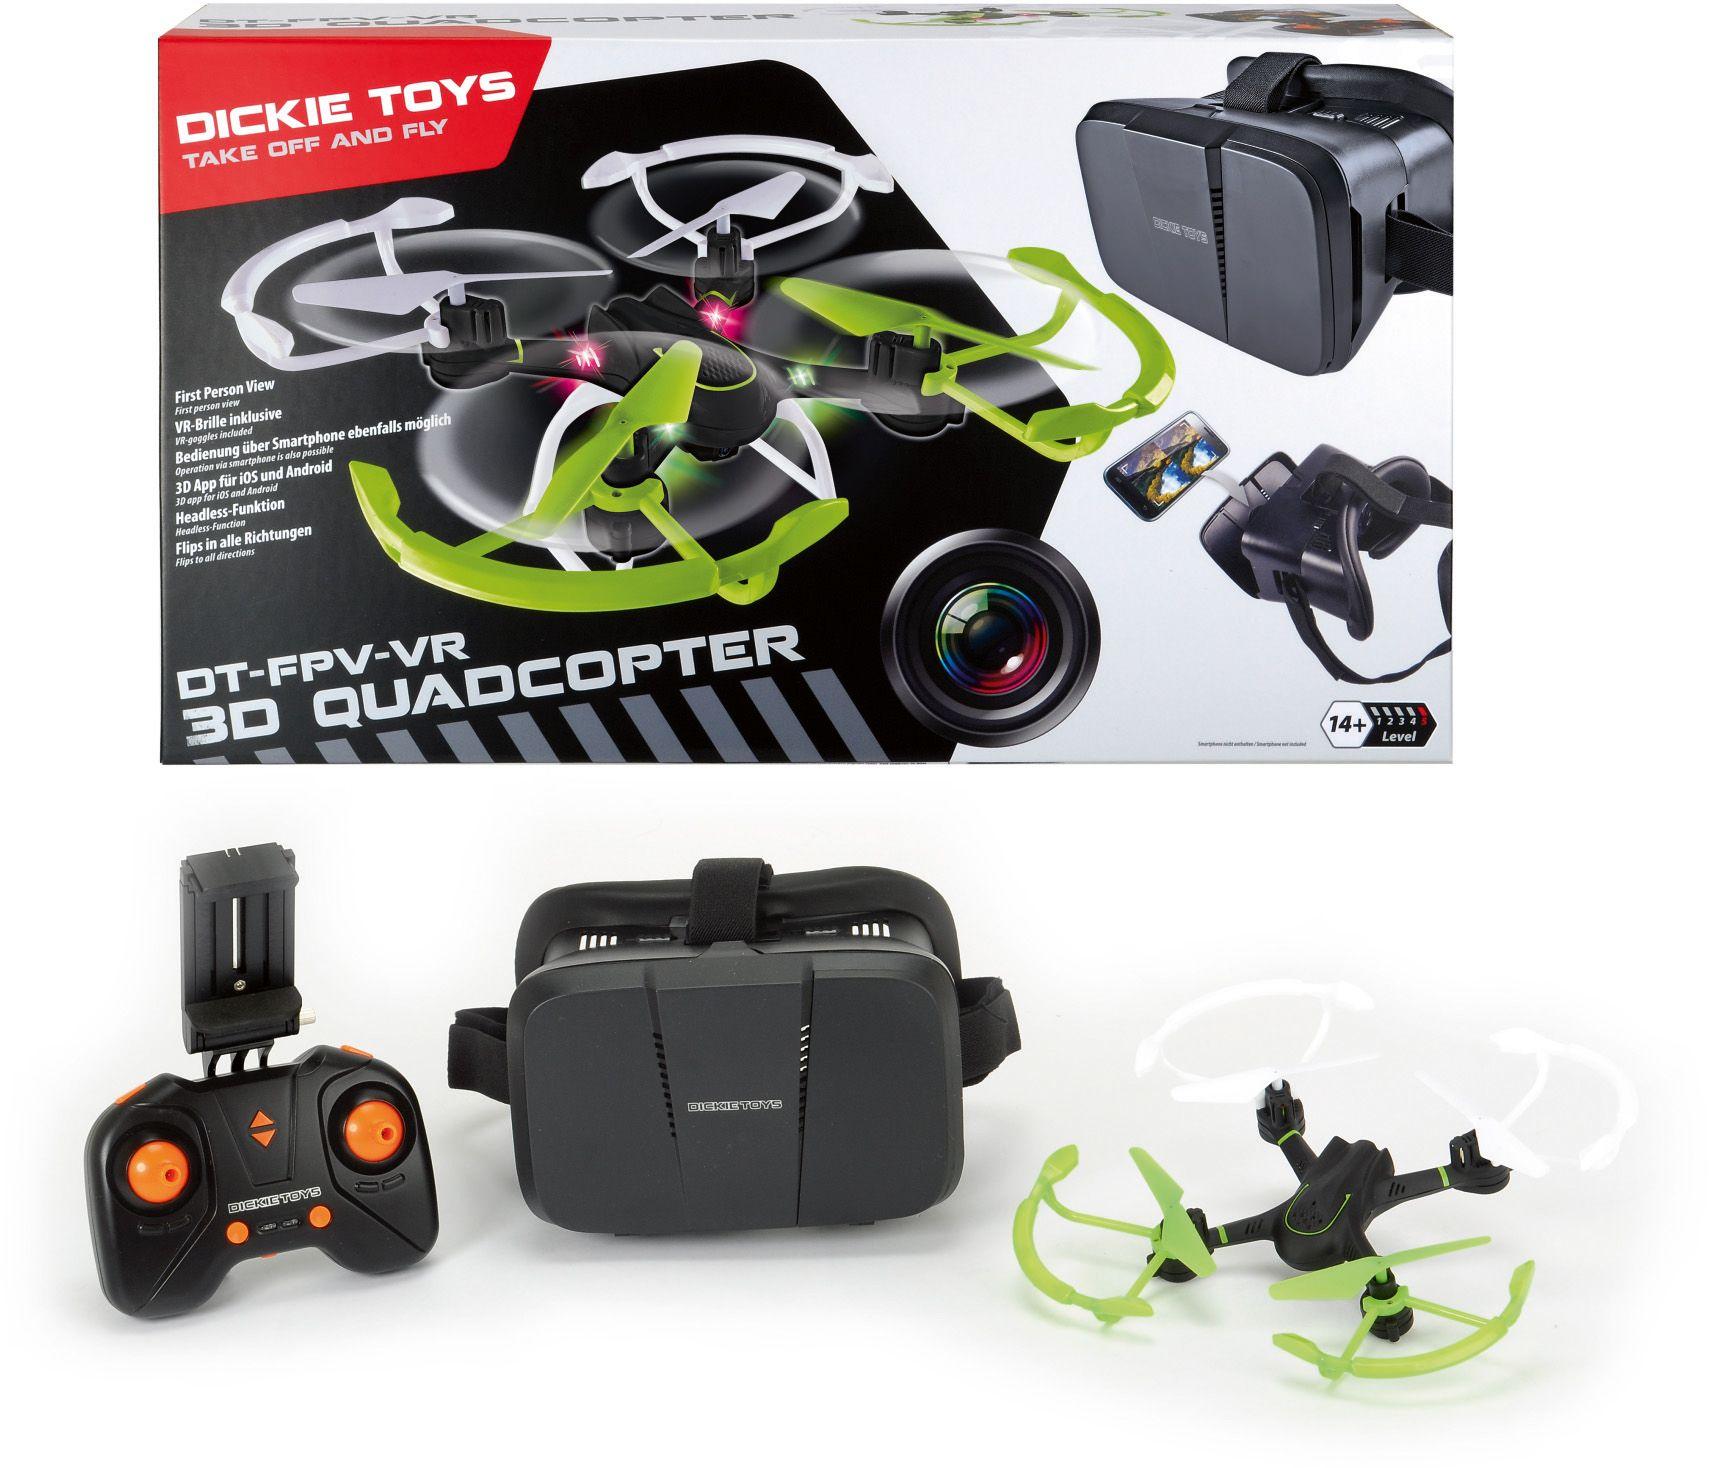 DICKIE TOYS Dickie RC FPV Quadrocopter